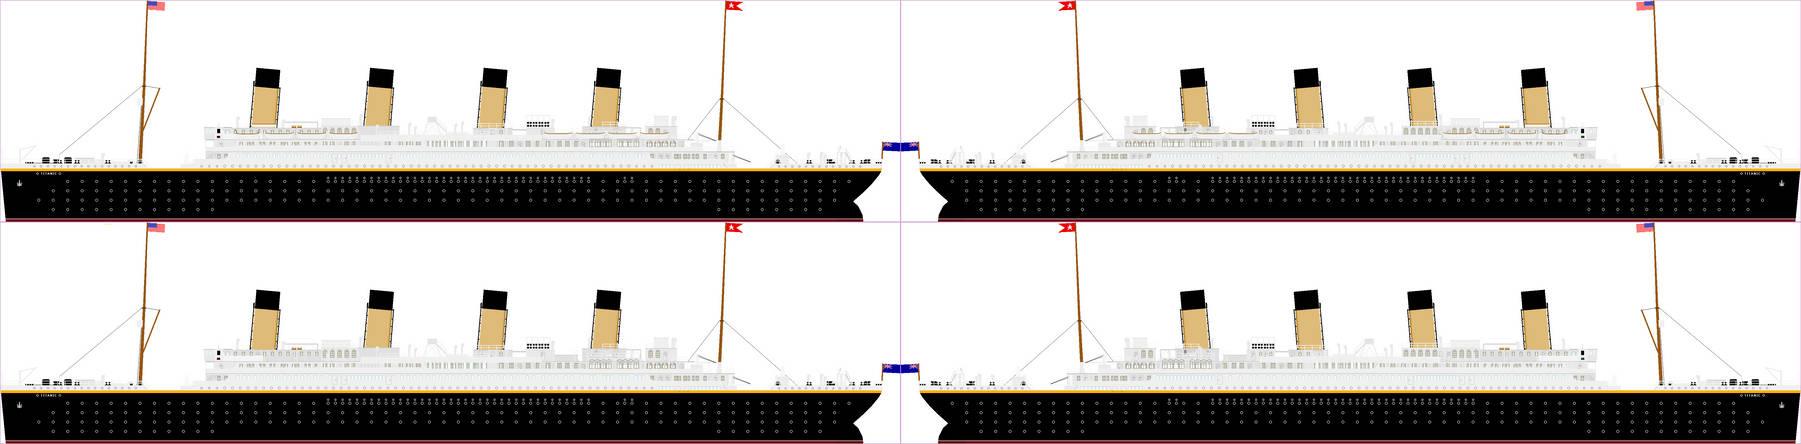 TUGS: RMS Titanic